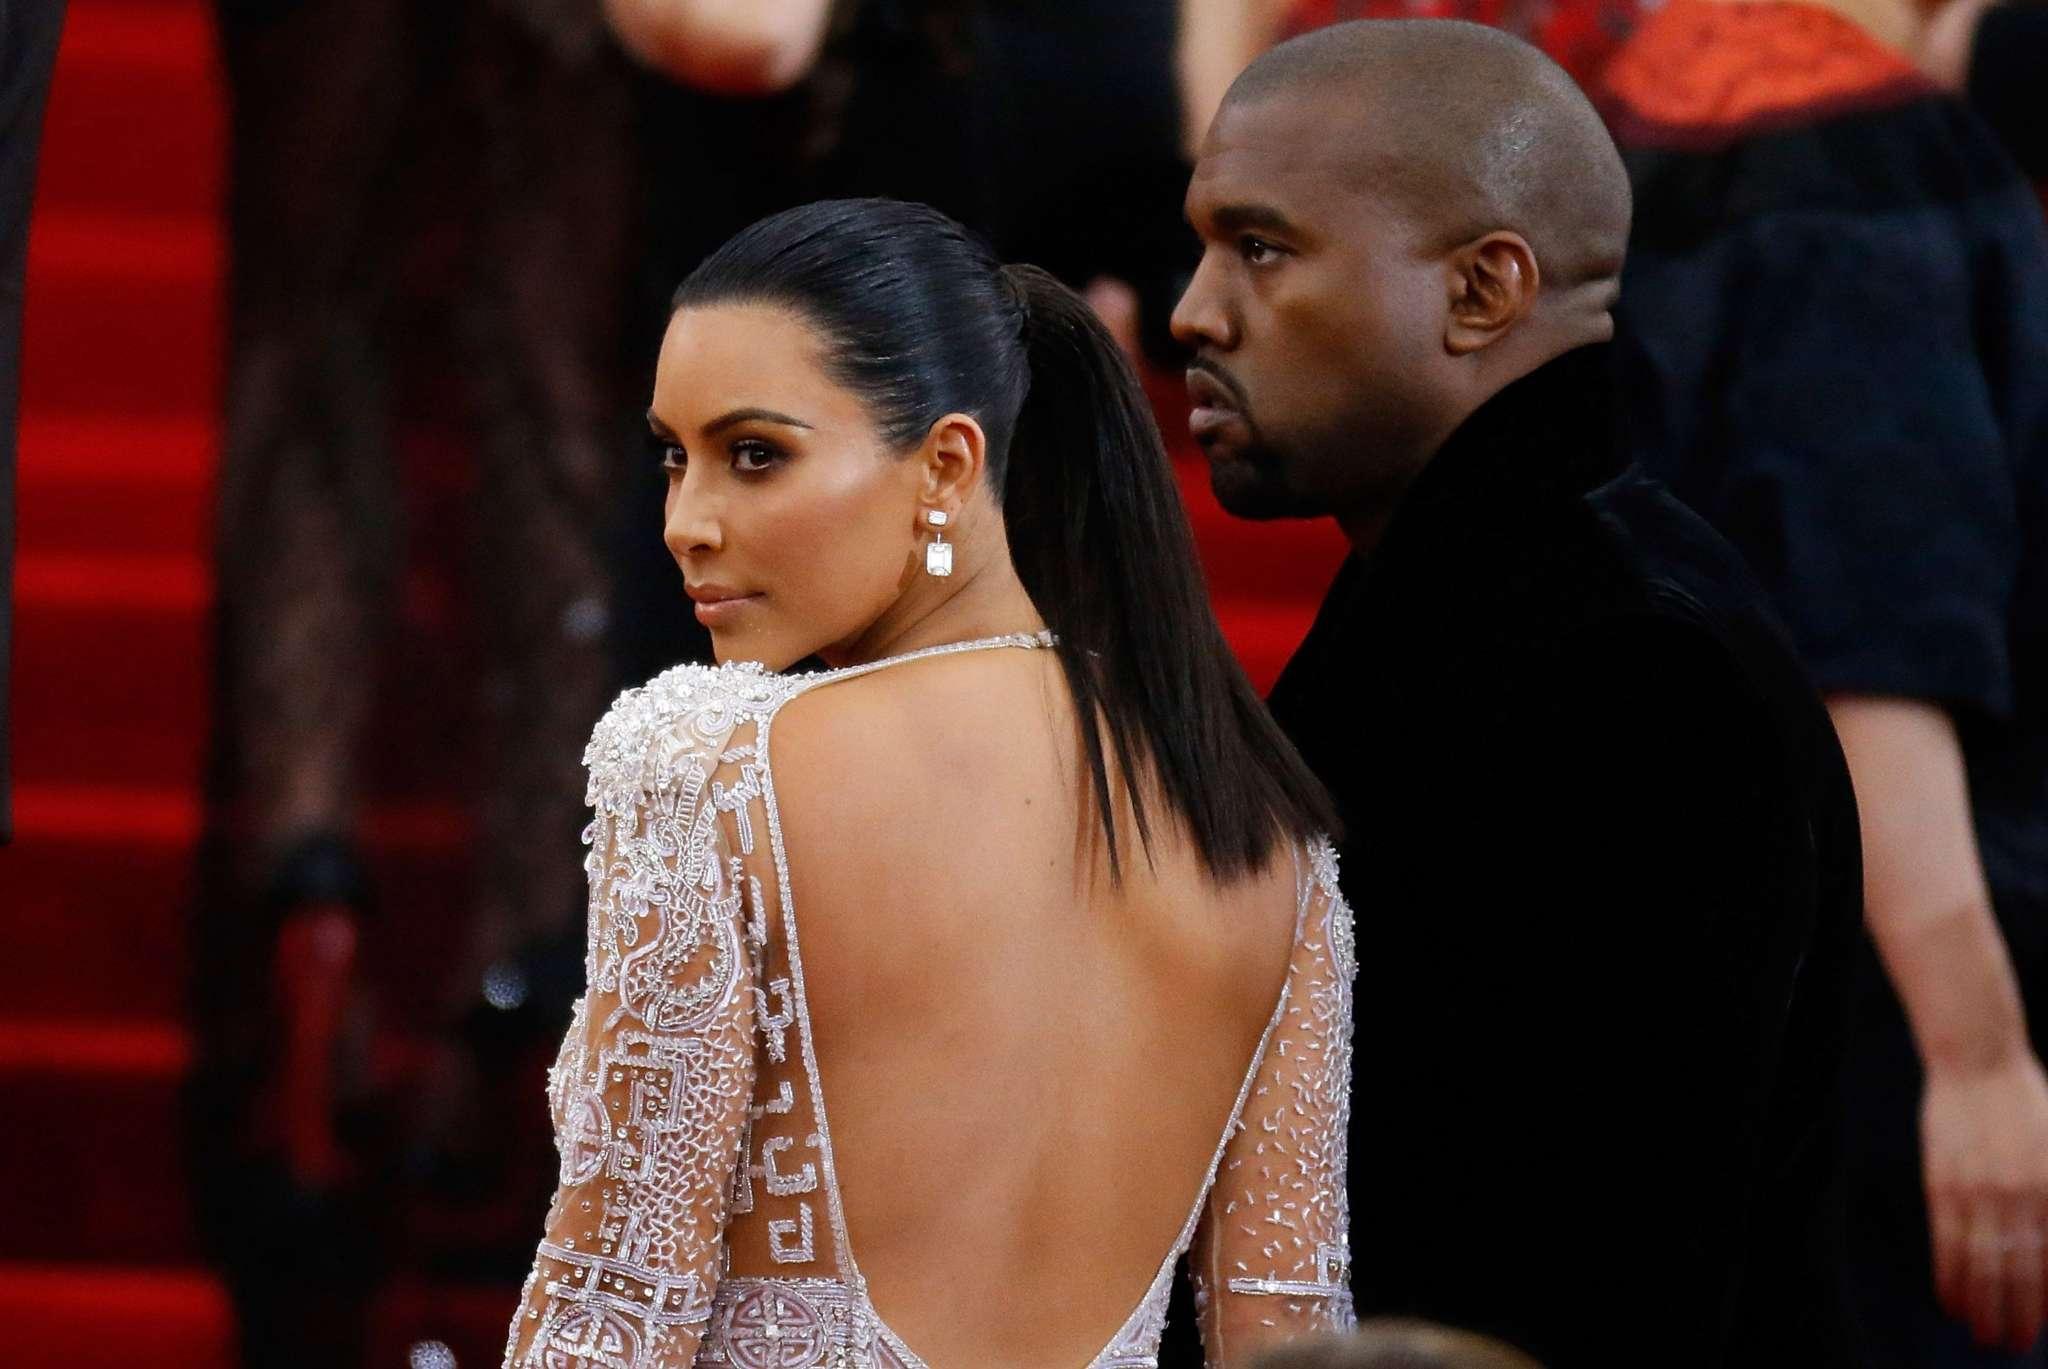 """kuwtk-kim-kardashian-going-through-a-really-tough-time-amid-husband-kanye-wests-embarrassing-social-media-rants-heres-why"""